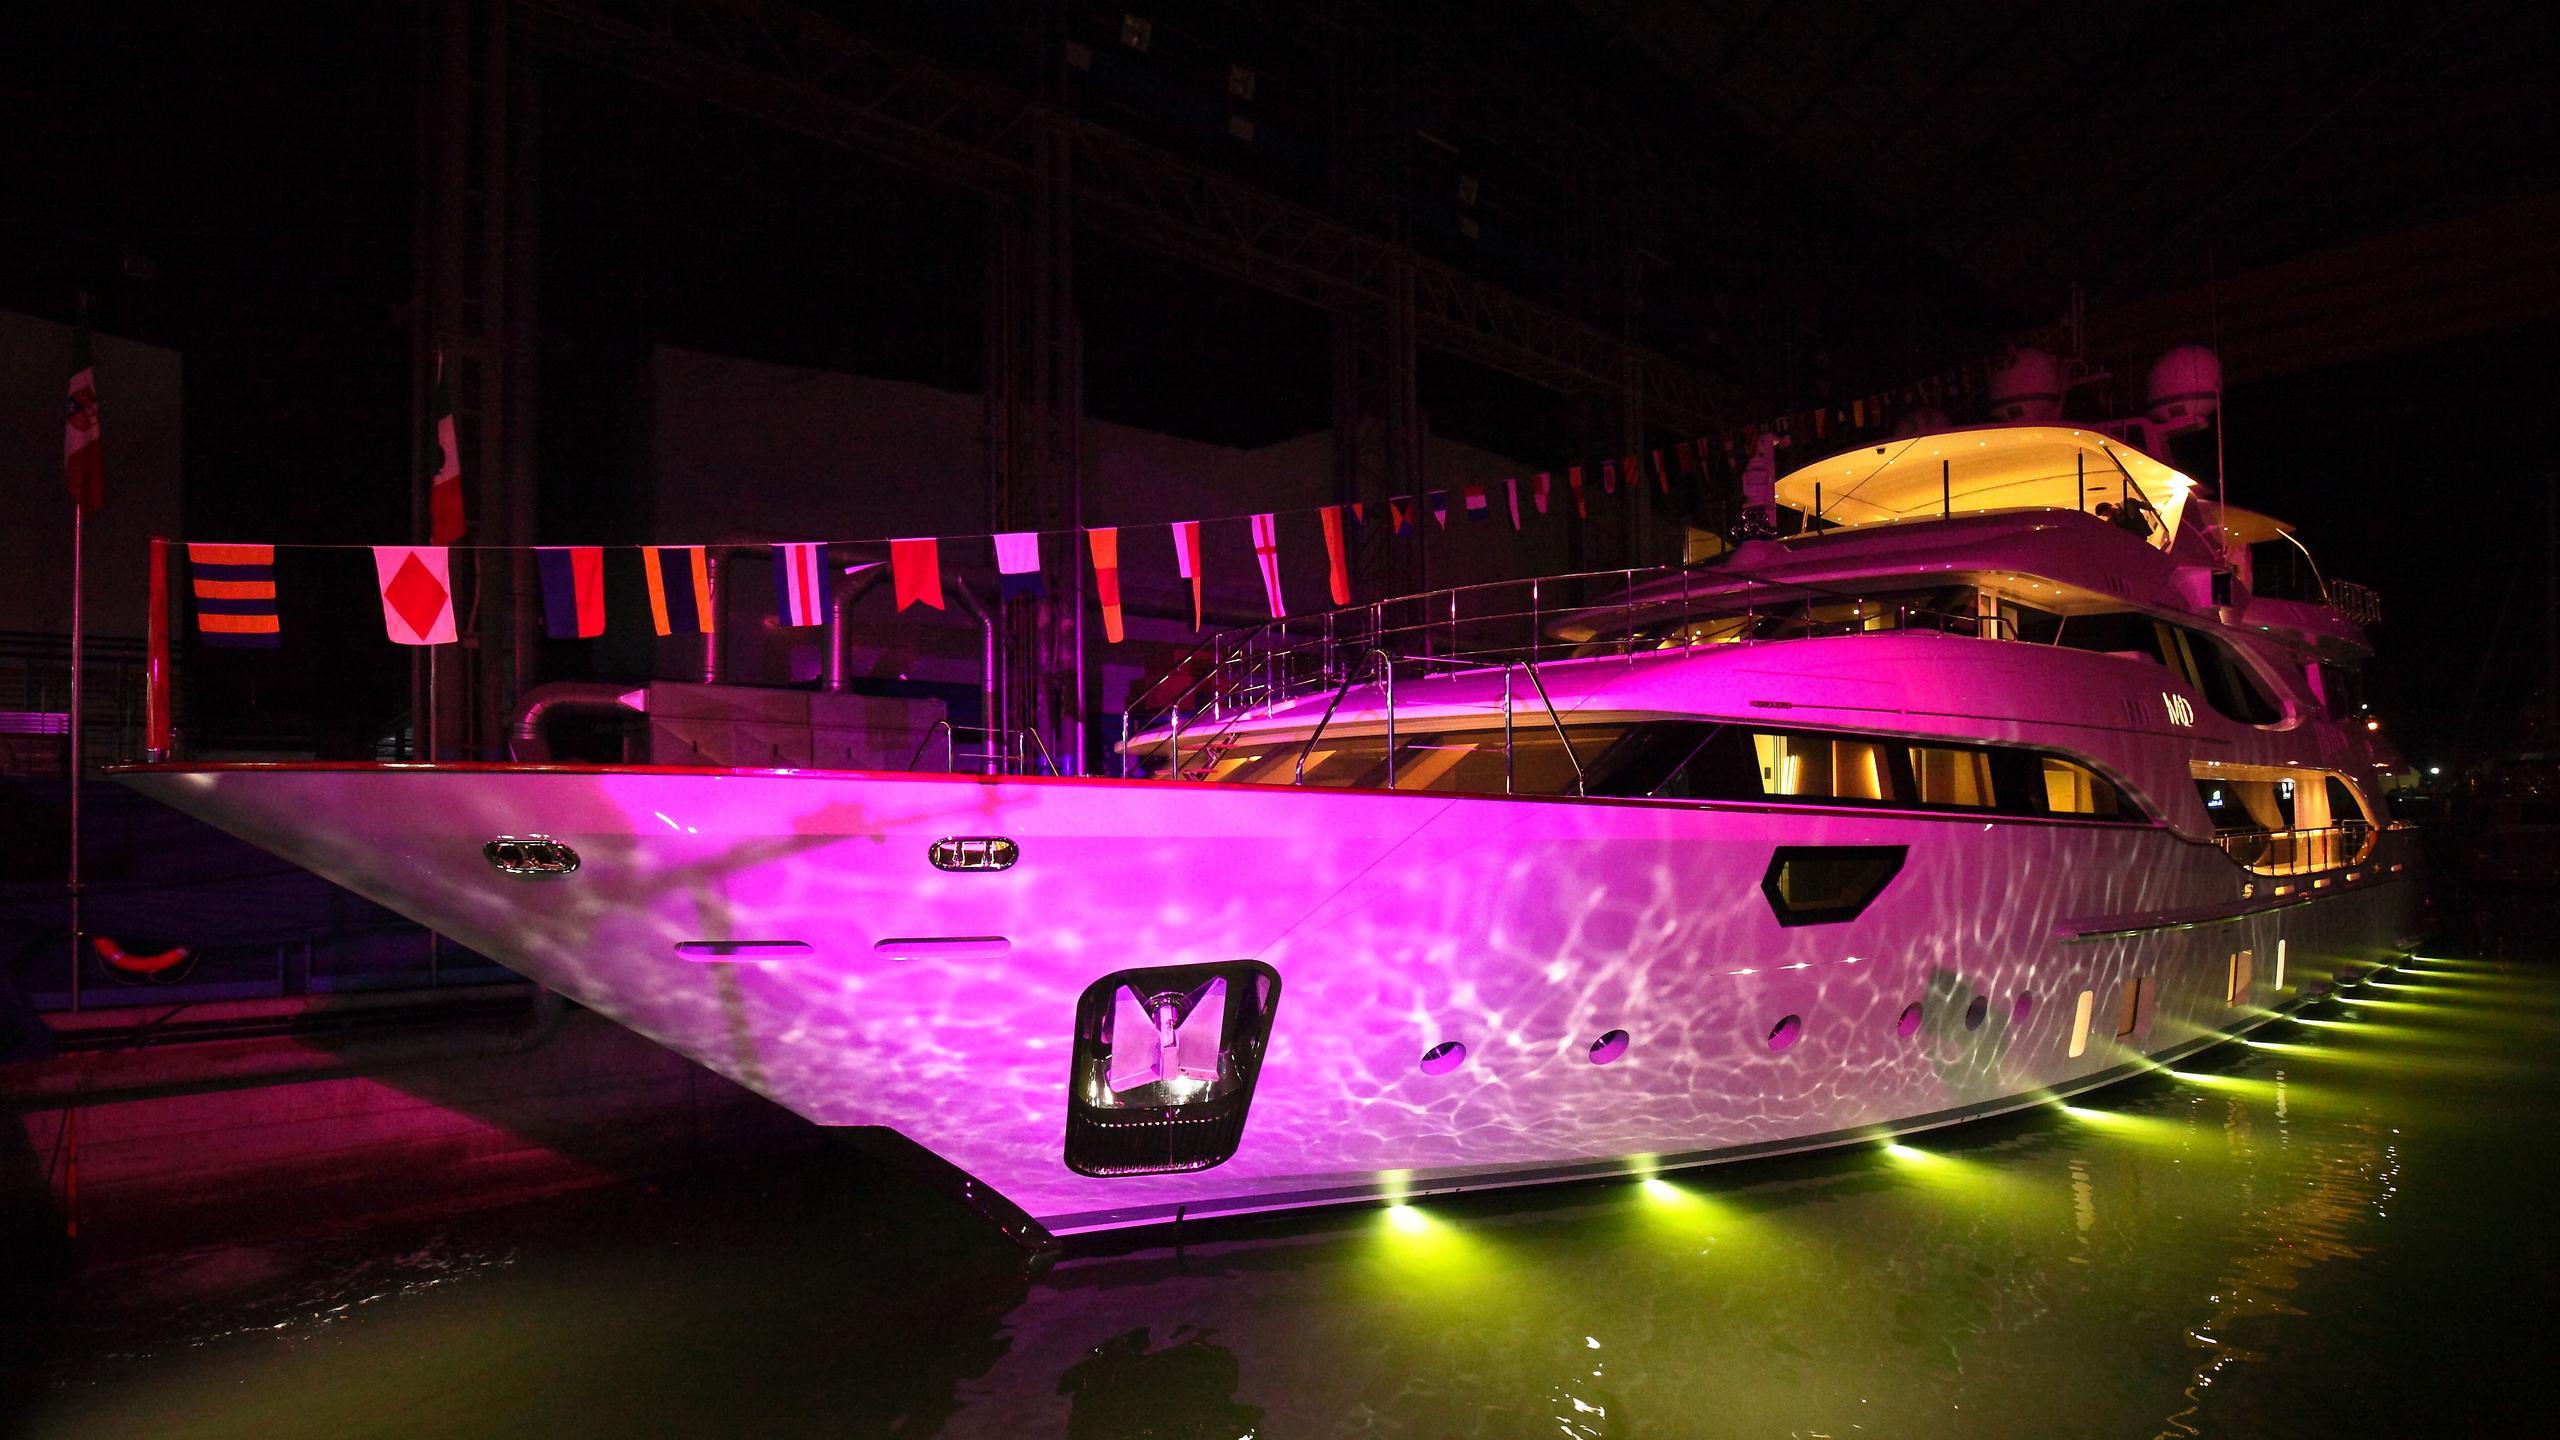 mr-d-motoryacht-benetti-2015-42m-half-profile-christening